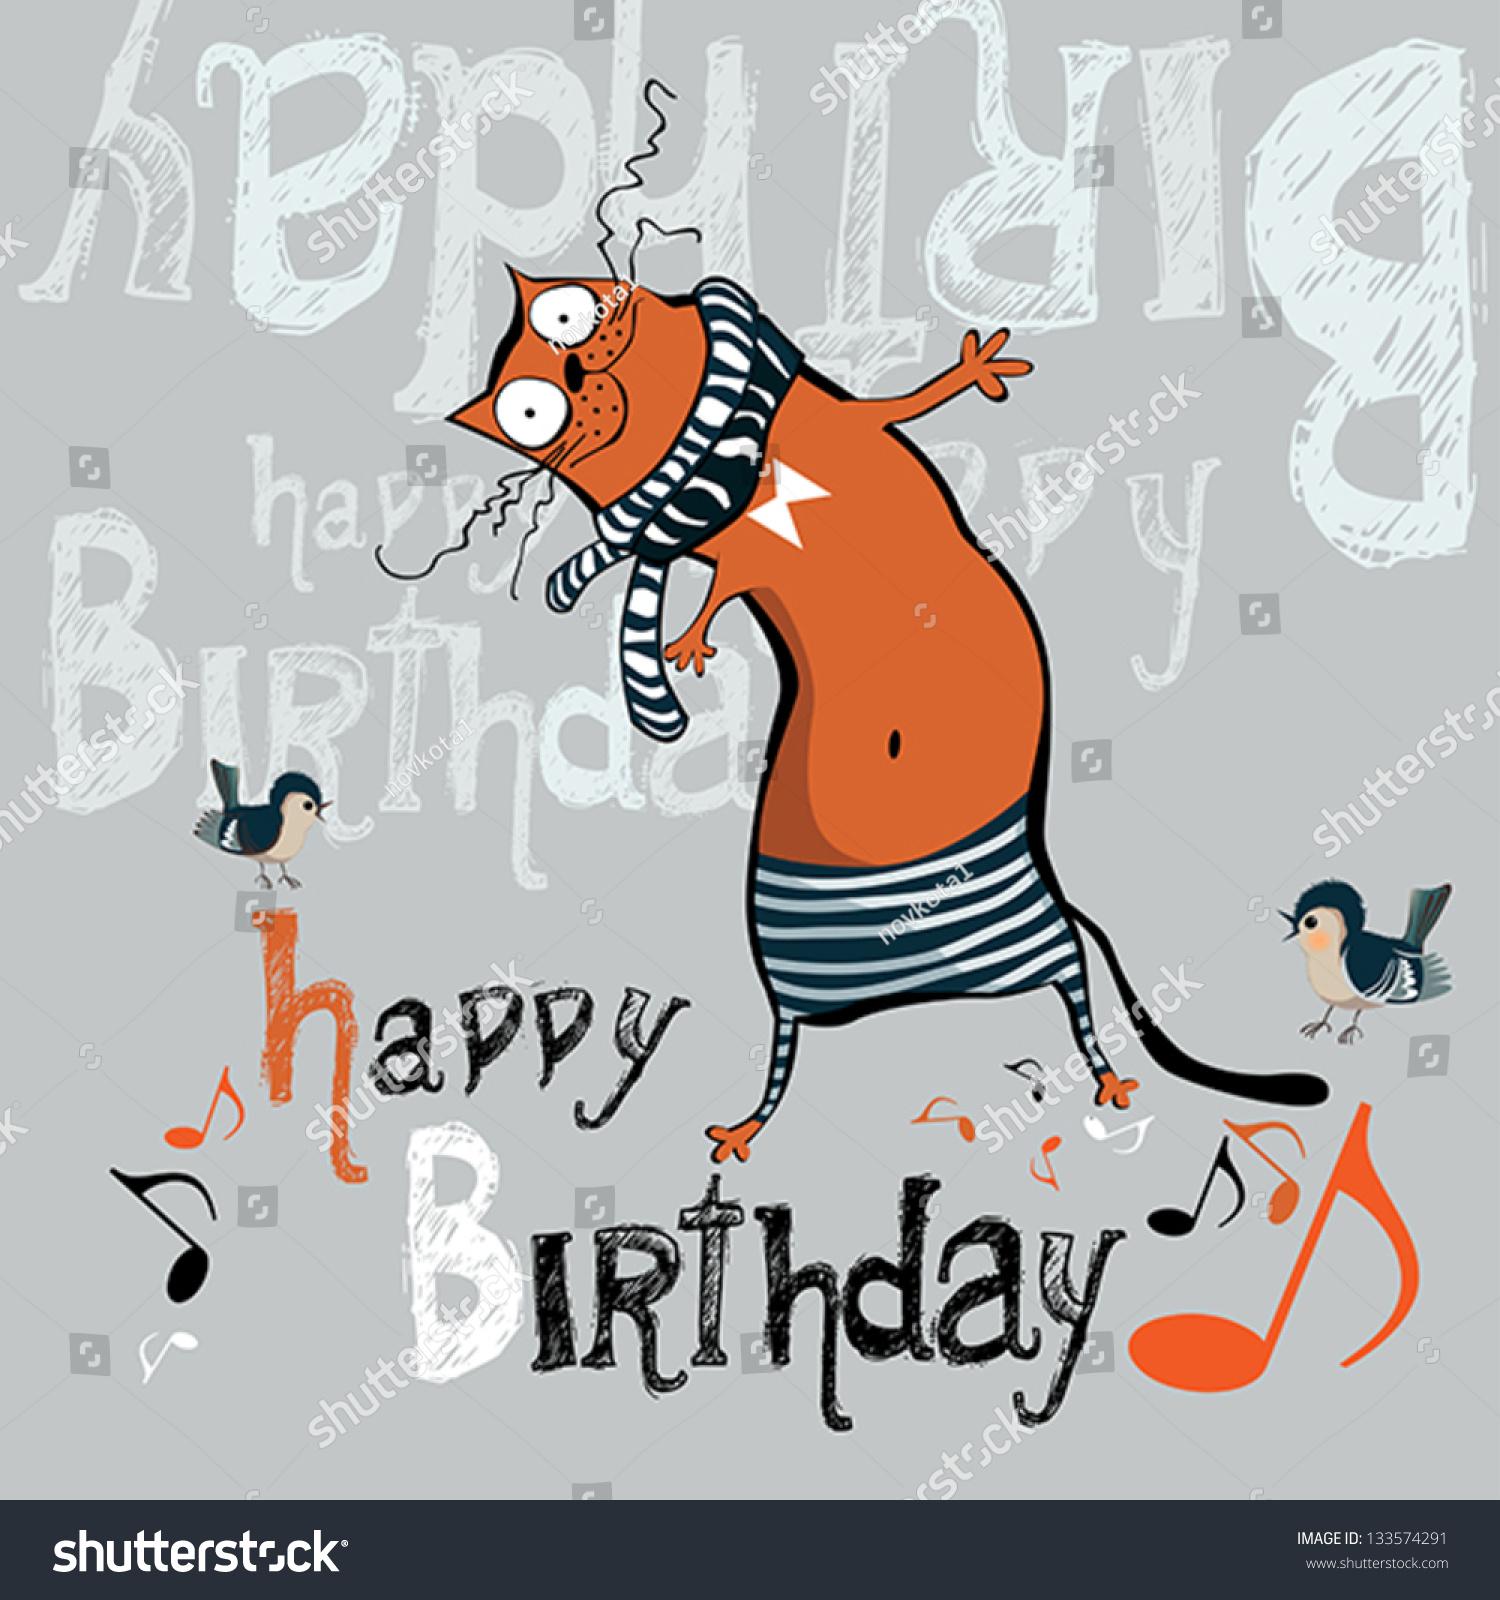 Happy Birthday Funny Cards gangcraftnet – Birthday Funny Card